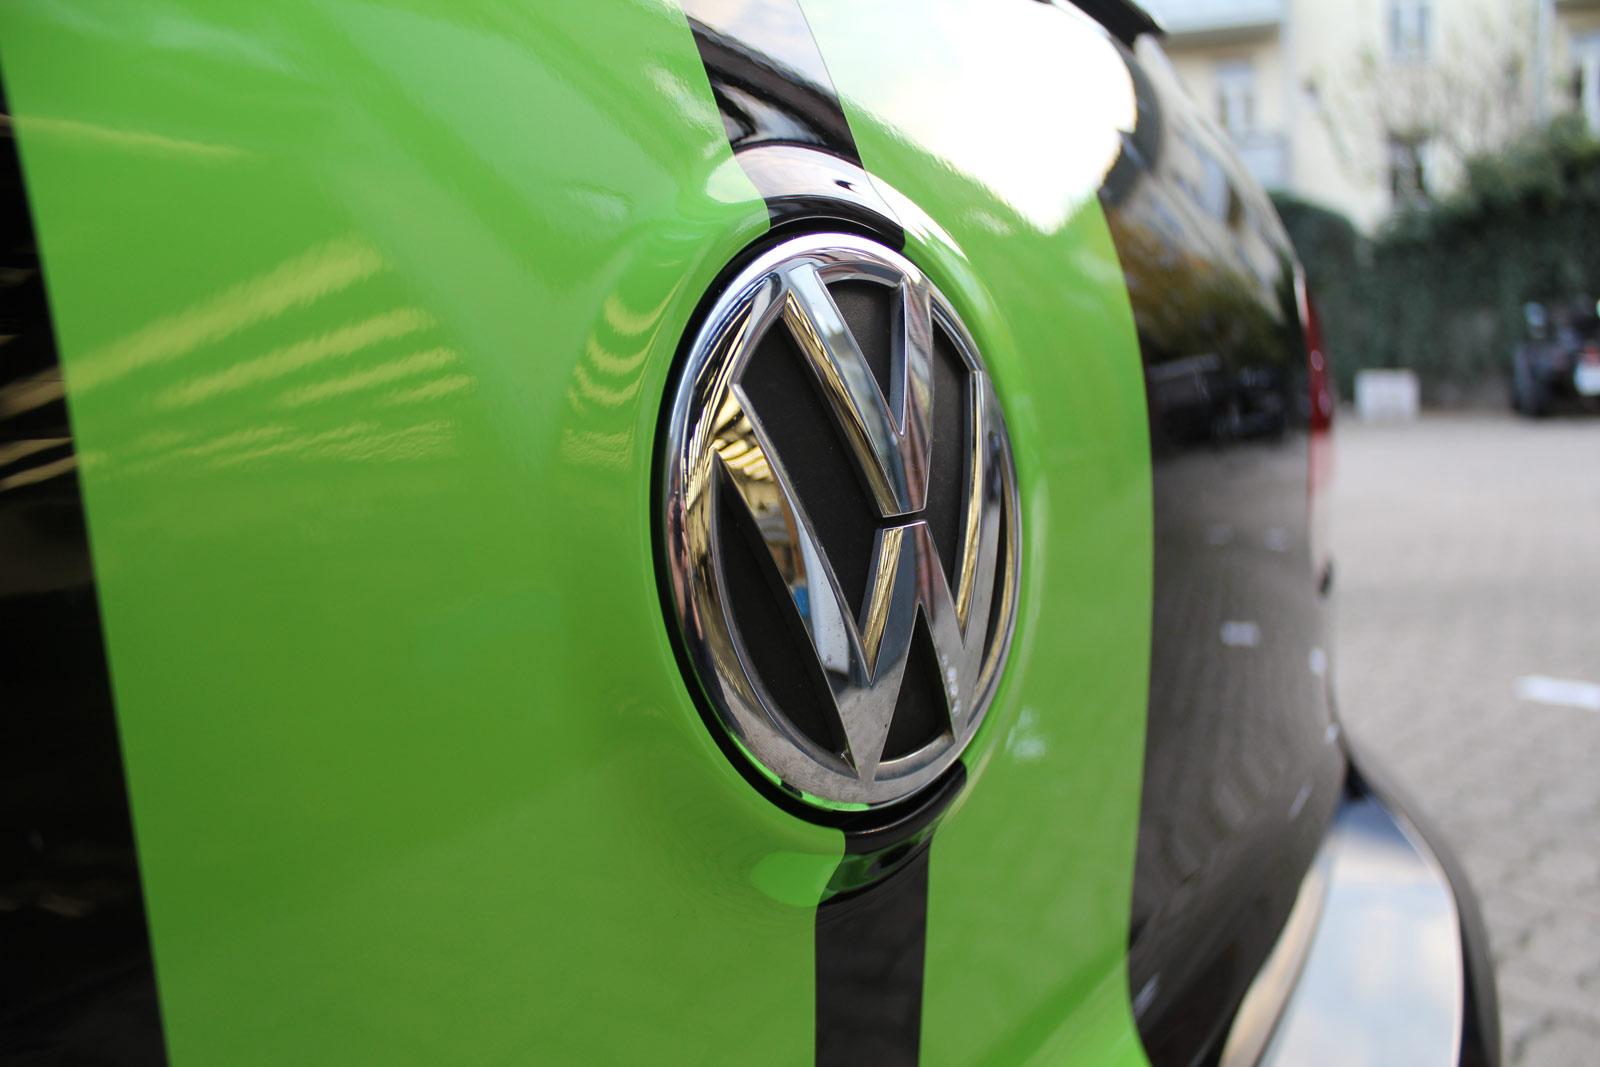 VW_GOLF_RALLYE_STREIFEN_GRUENE_FOLIE_46